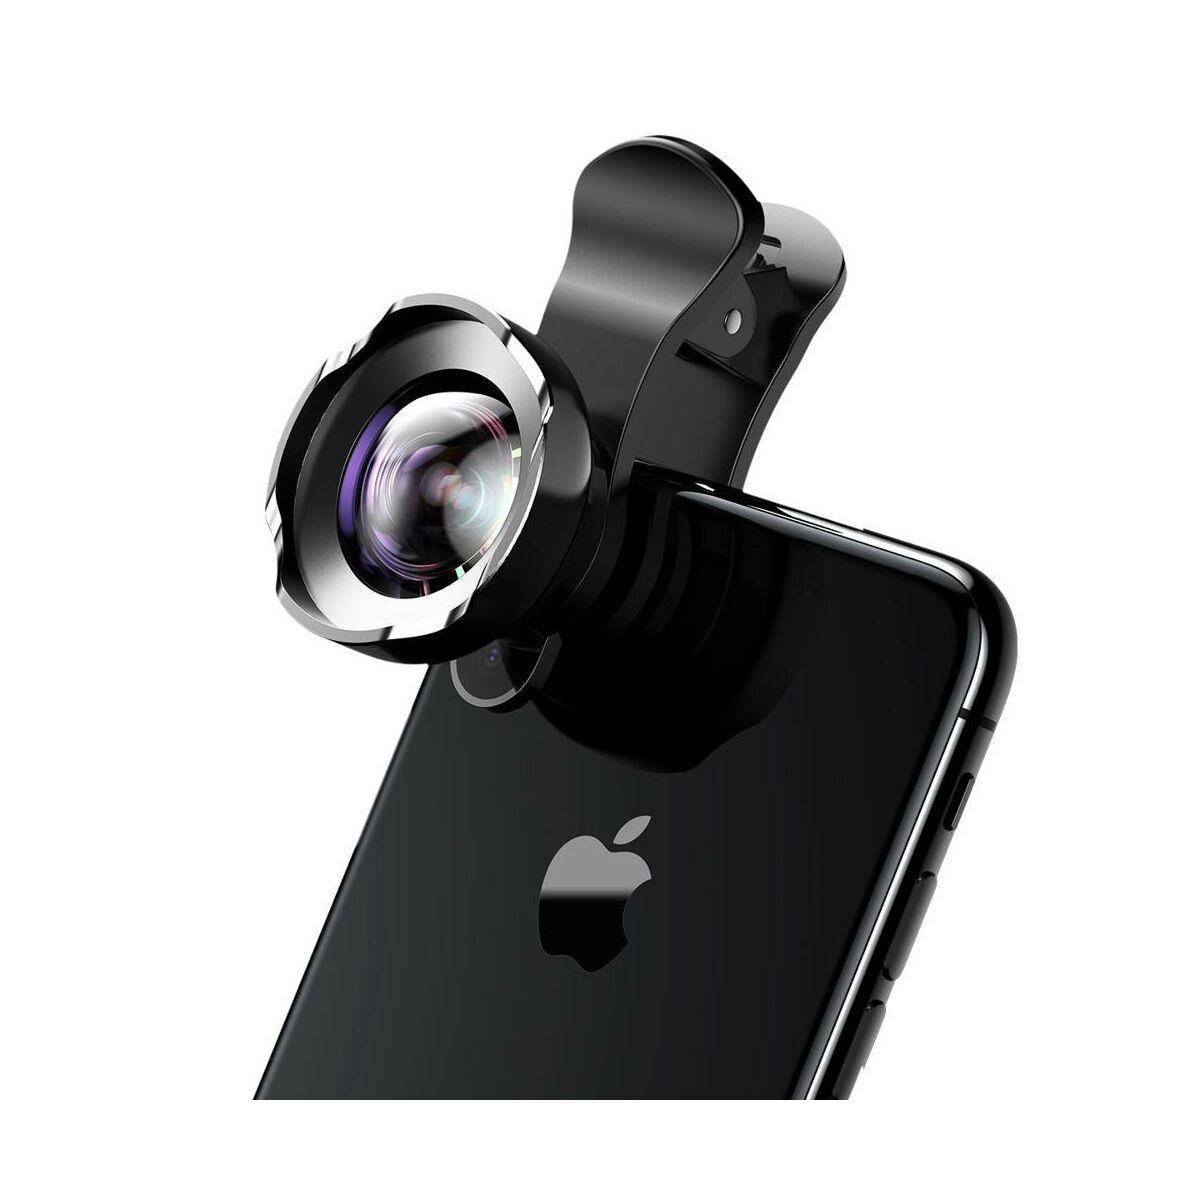 Baseus kamera optika mobilhoz Short Videos Magic (Hi-definition), fekete (ACSXT-A01)